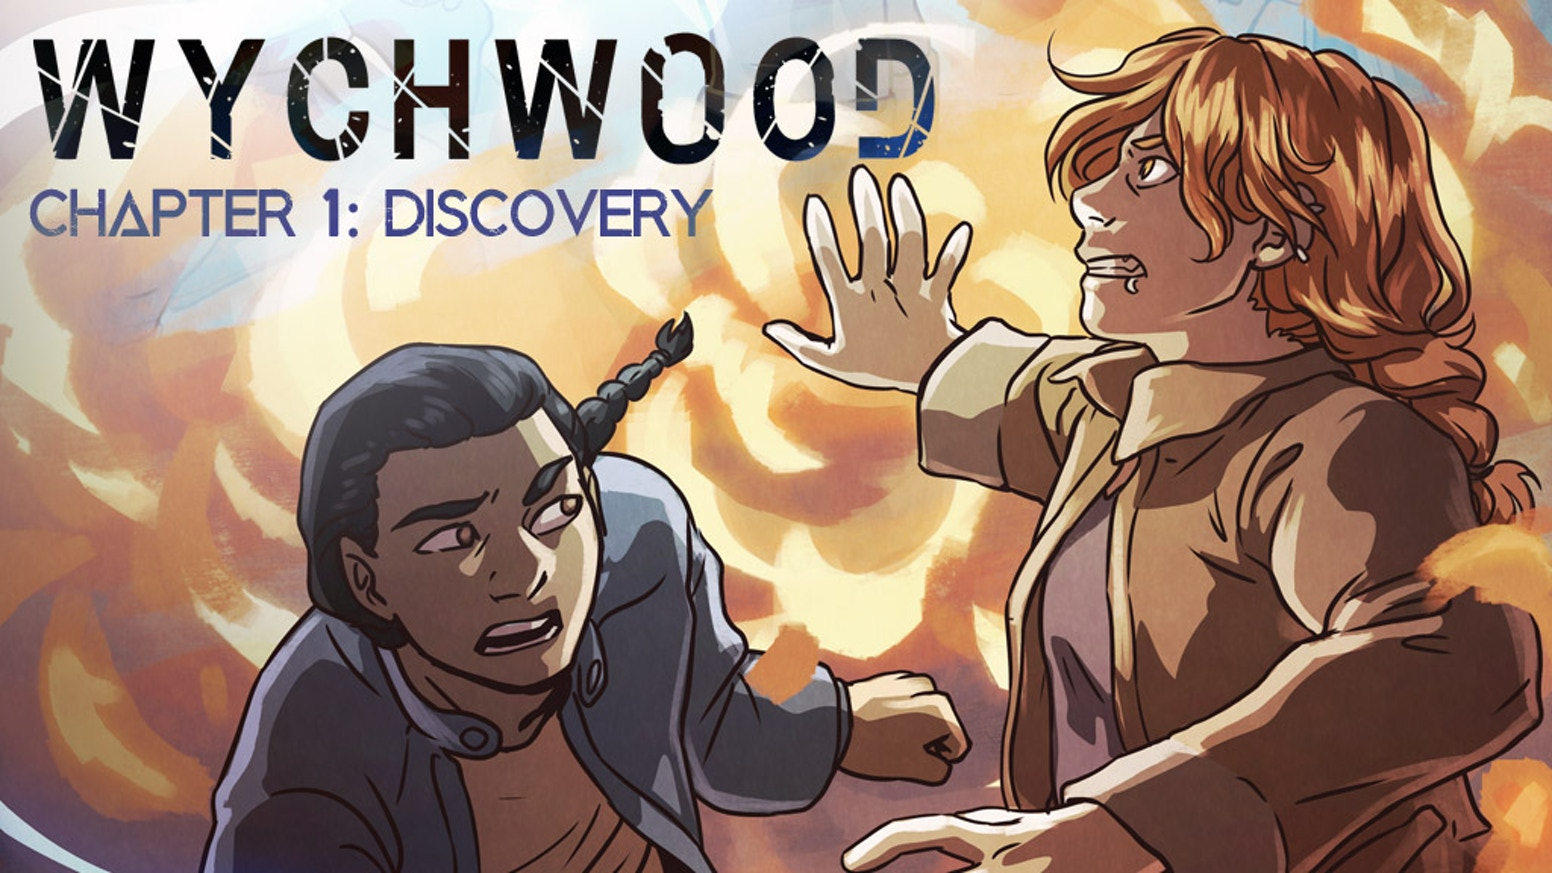 A limited-edition print run of the sci-fantasy webcomic Wychwood